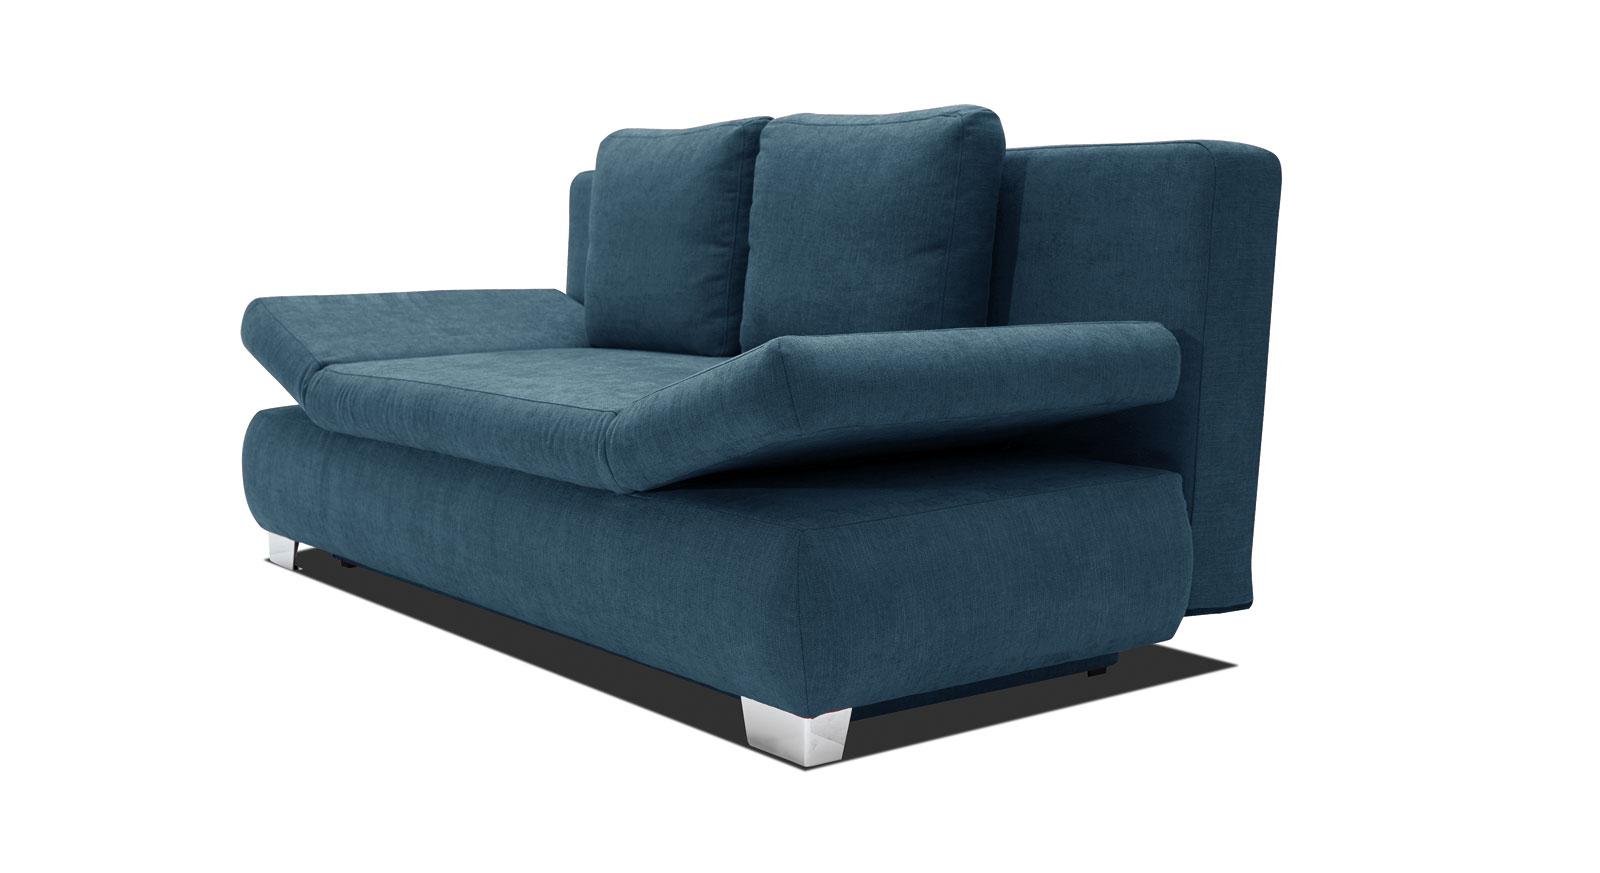 das schlafsofa blue river mit verchromten f en hier mit starrem. Black Bedroom Furniture Sets. Home Design Ideas